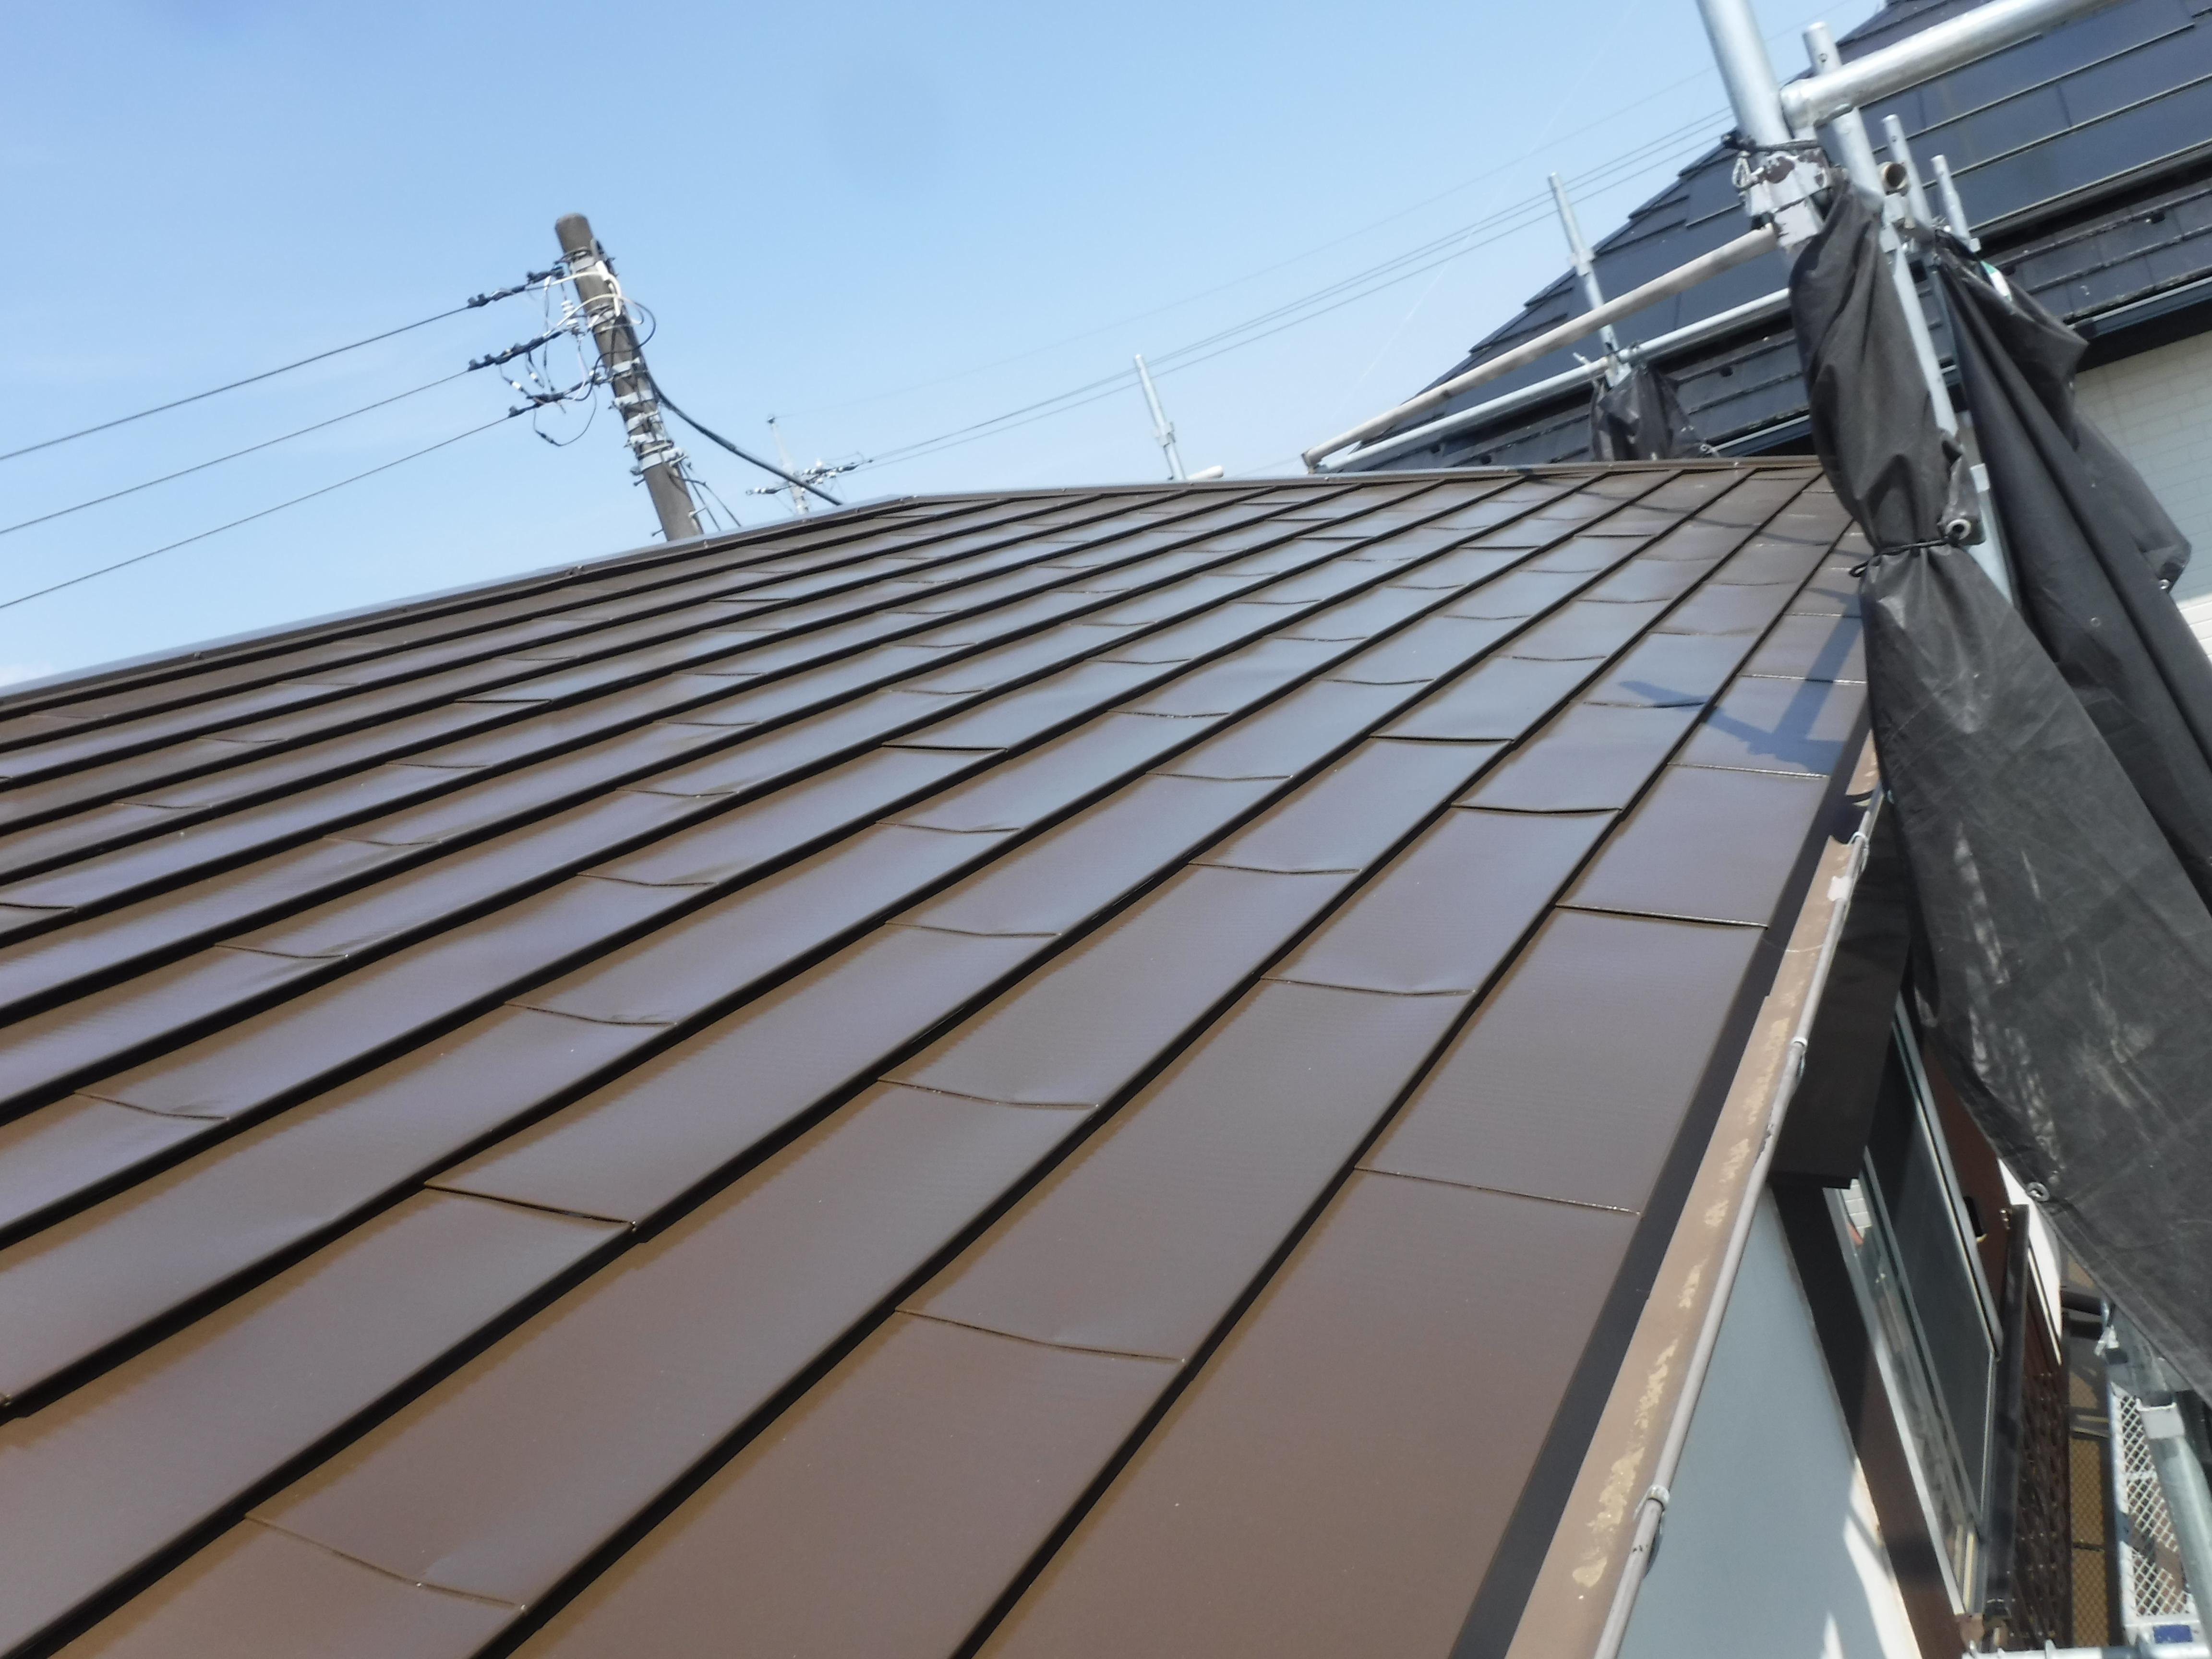 茂原市o様邸 屋根塗装工事 茂原市での外壁塗装屋根塗装リフォーム